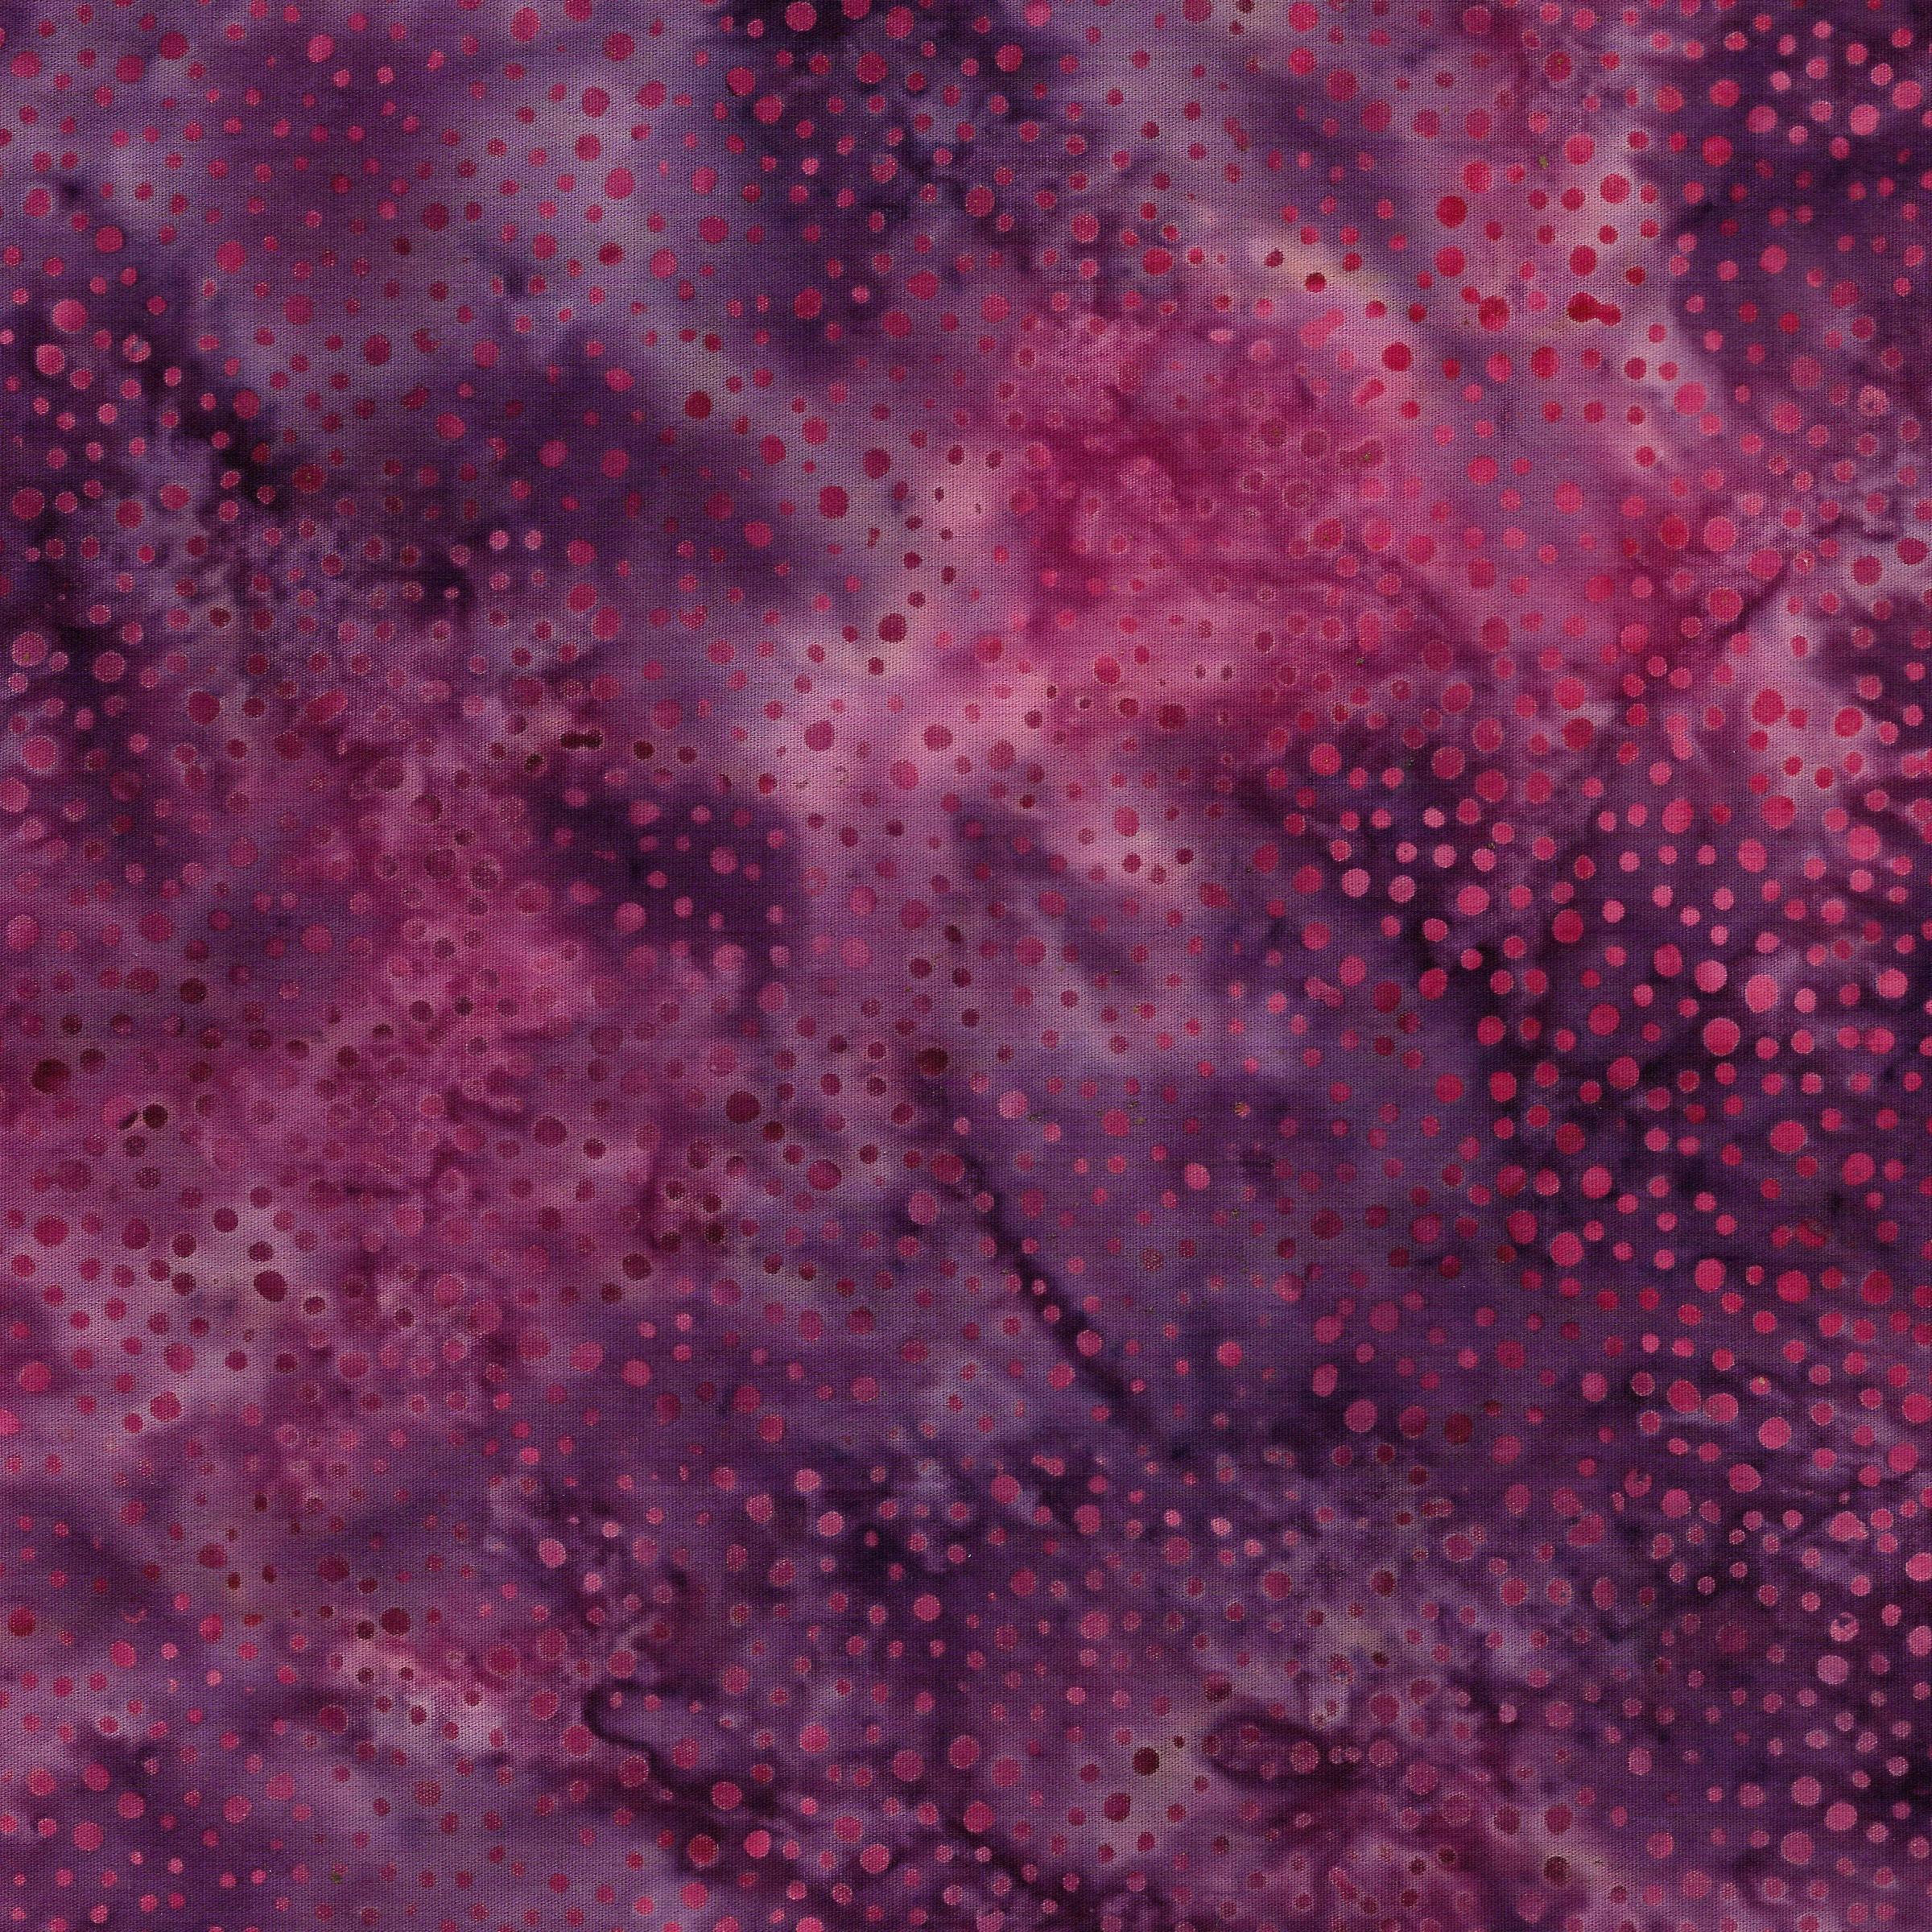 121822455 F181 Choir of Poppies Mini Dots Iris